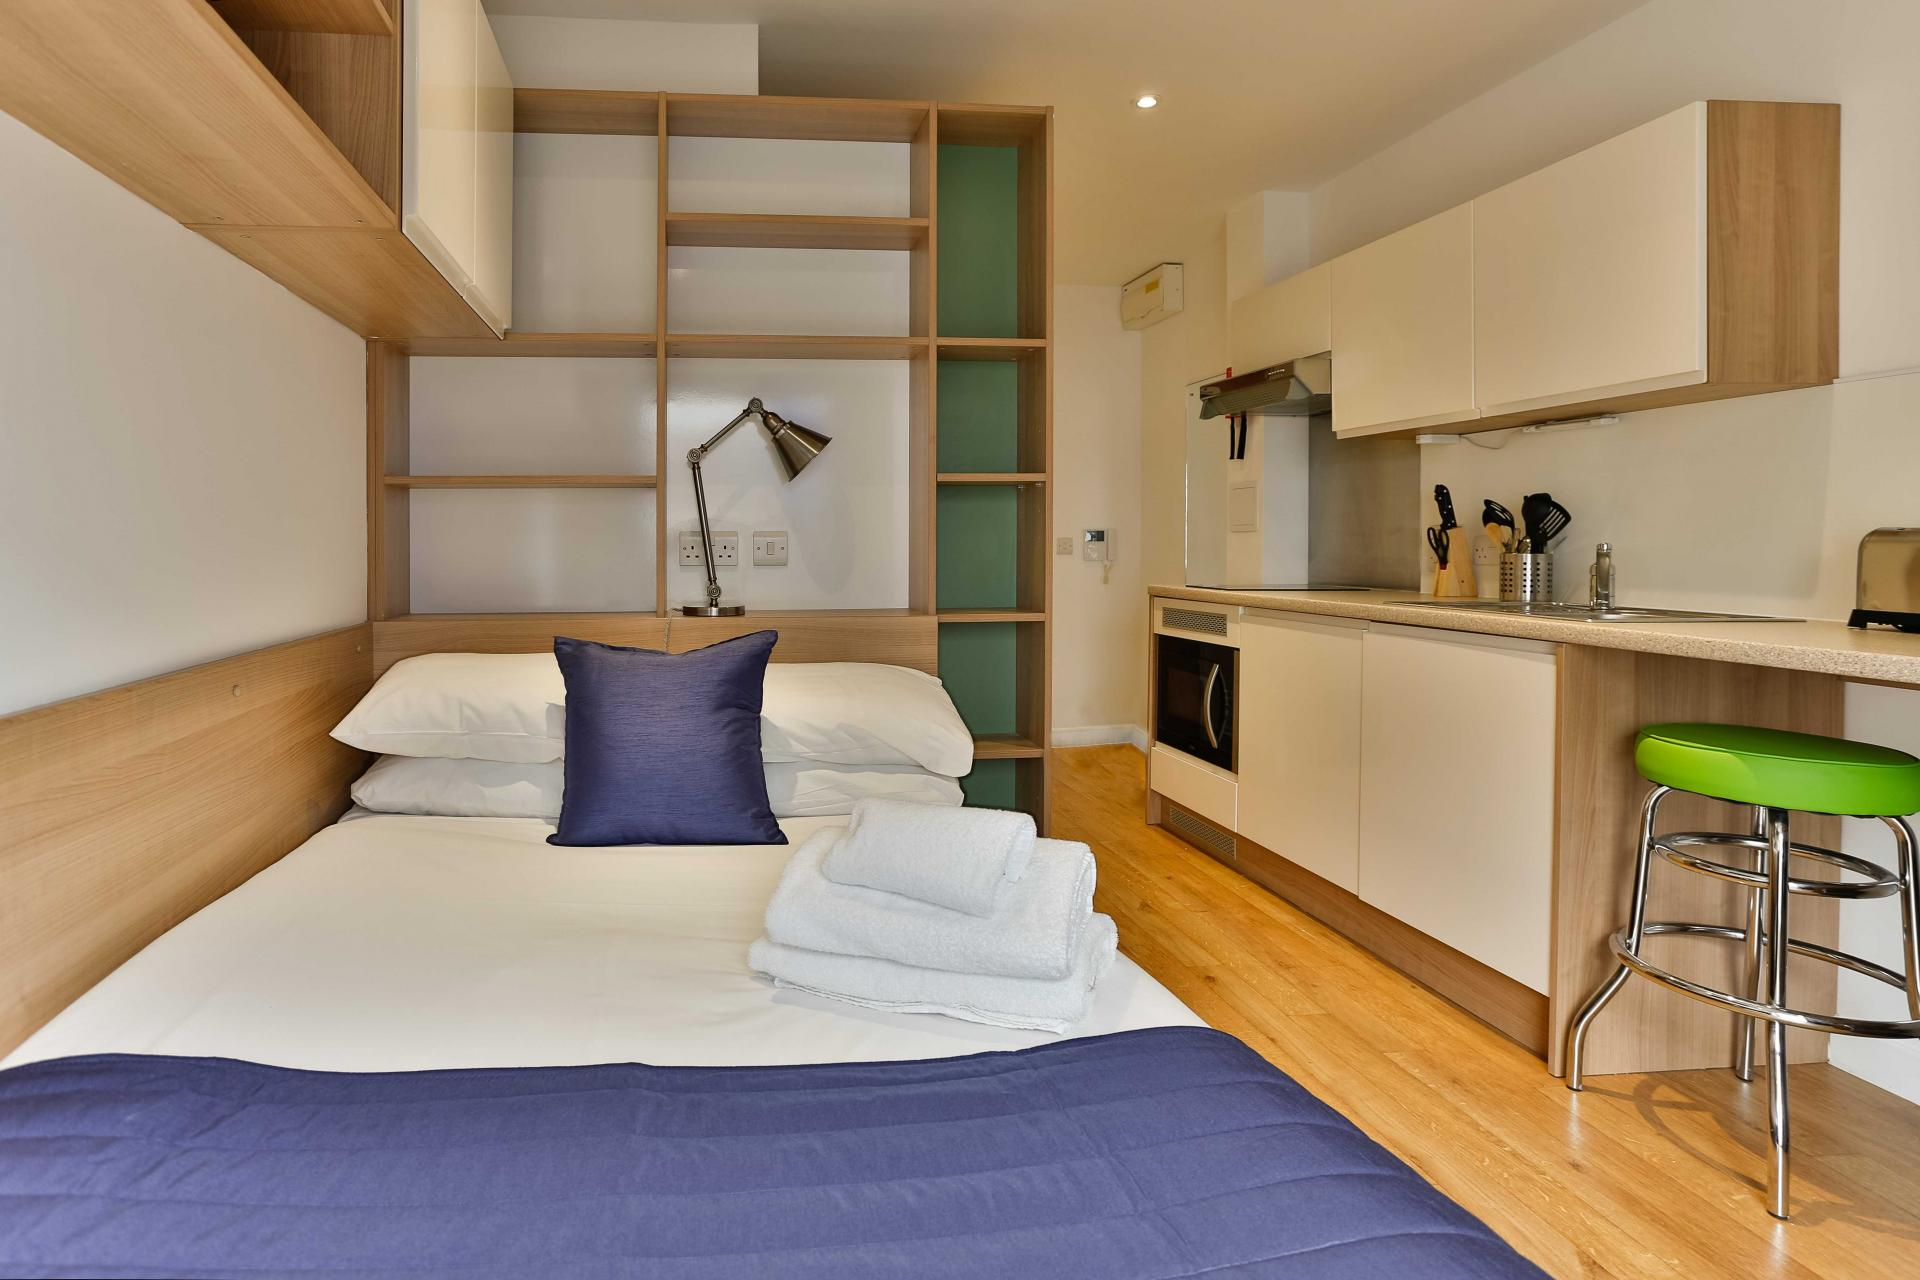 Studio at Park Lane Aparthotel, Centre, Cardiff - Citybase Apartments